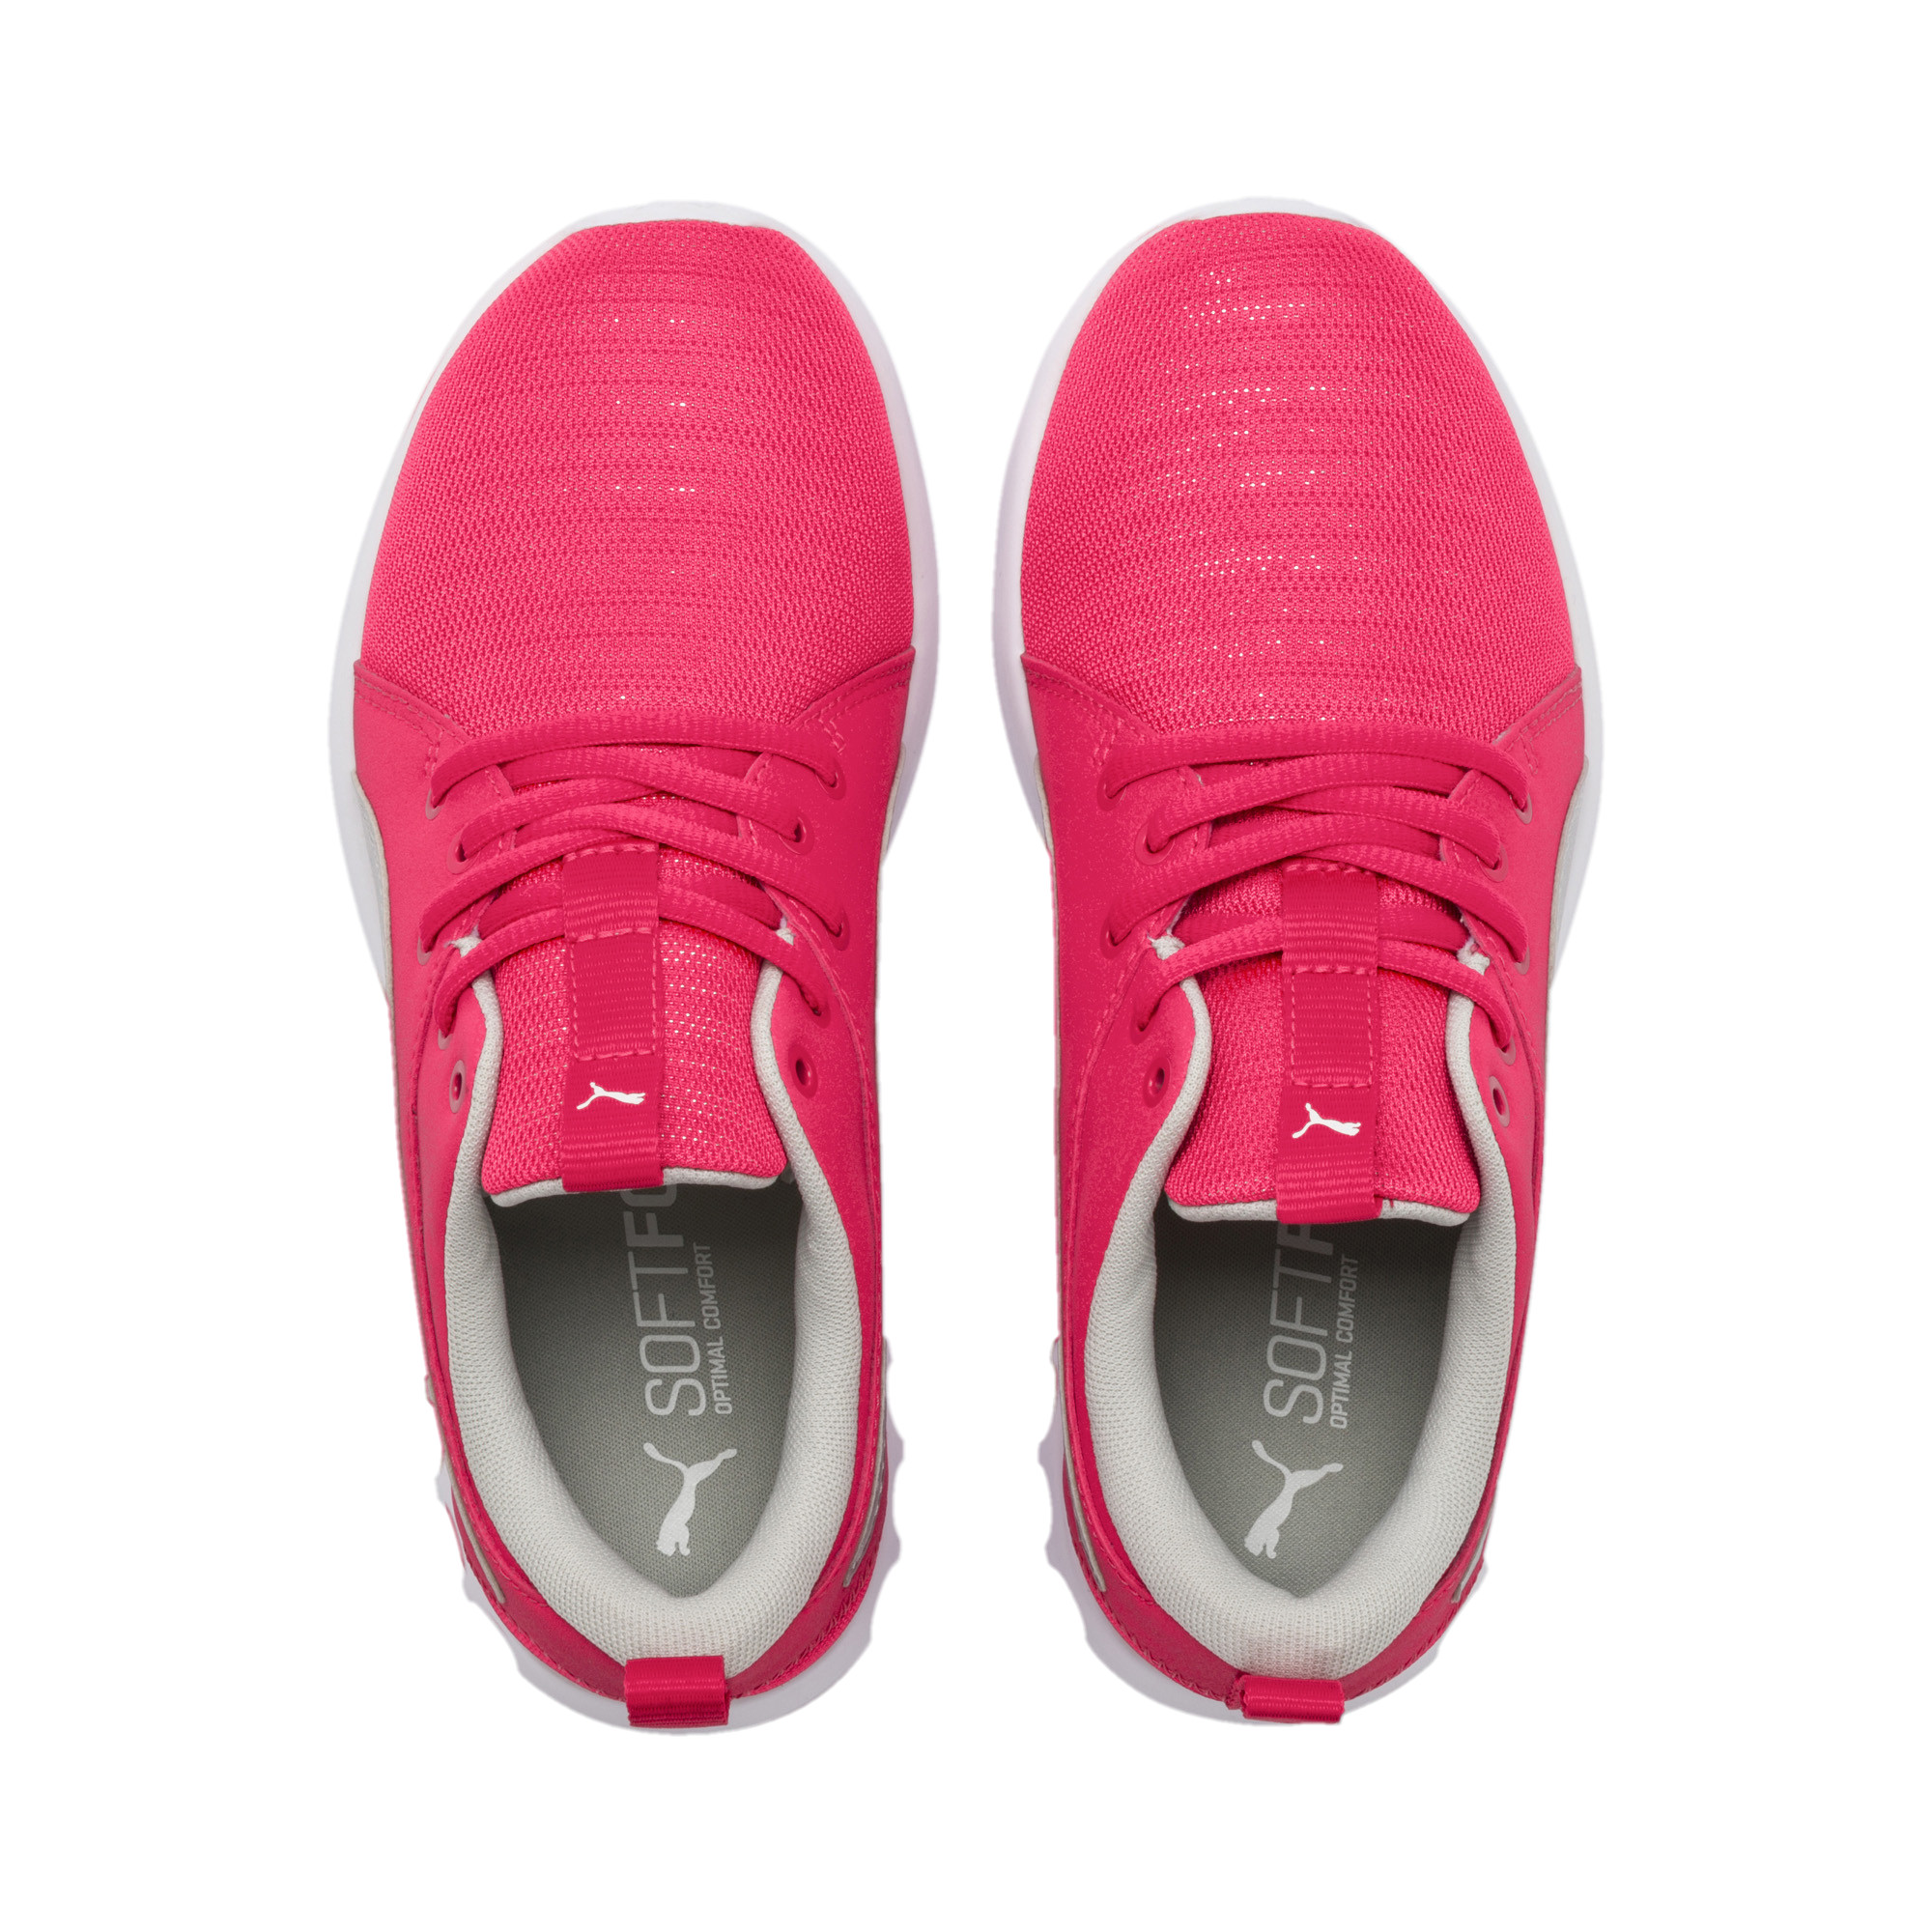 PUMA-Carson-2-Glitz-Shoes-JR-Girls-Shoe-Kids thumbnail 7